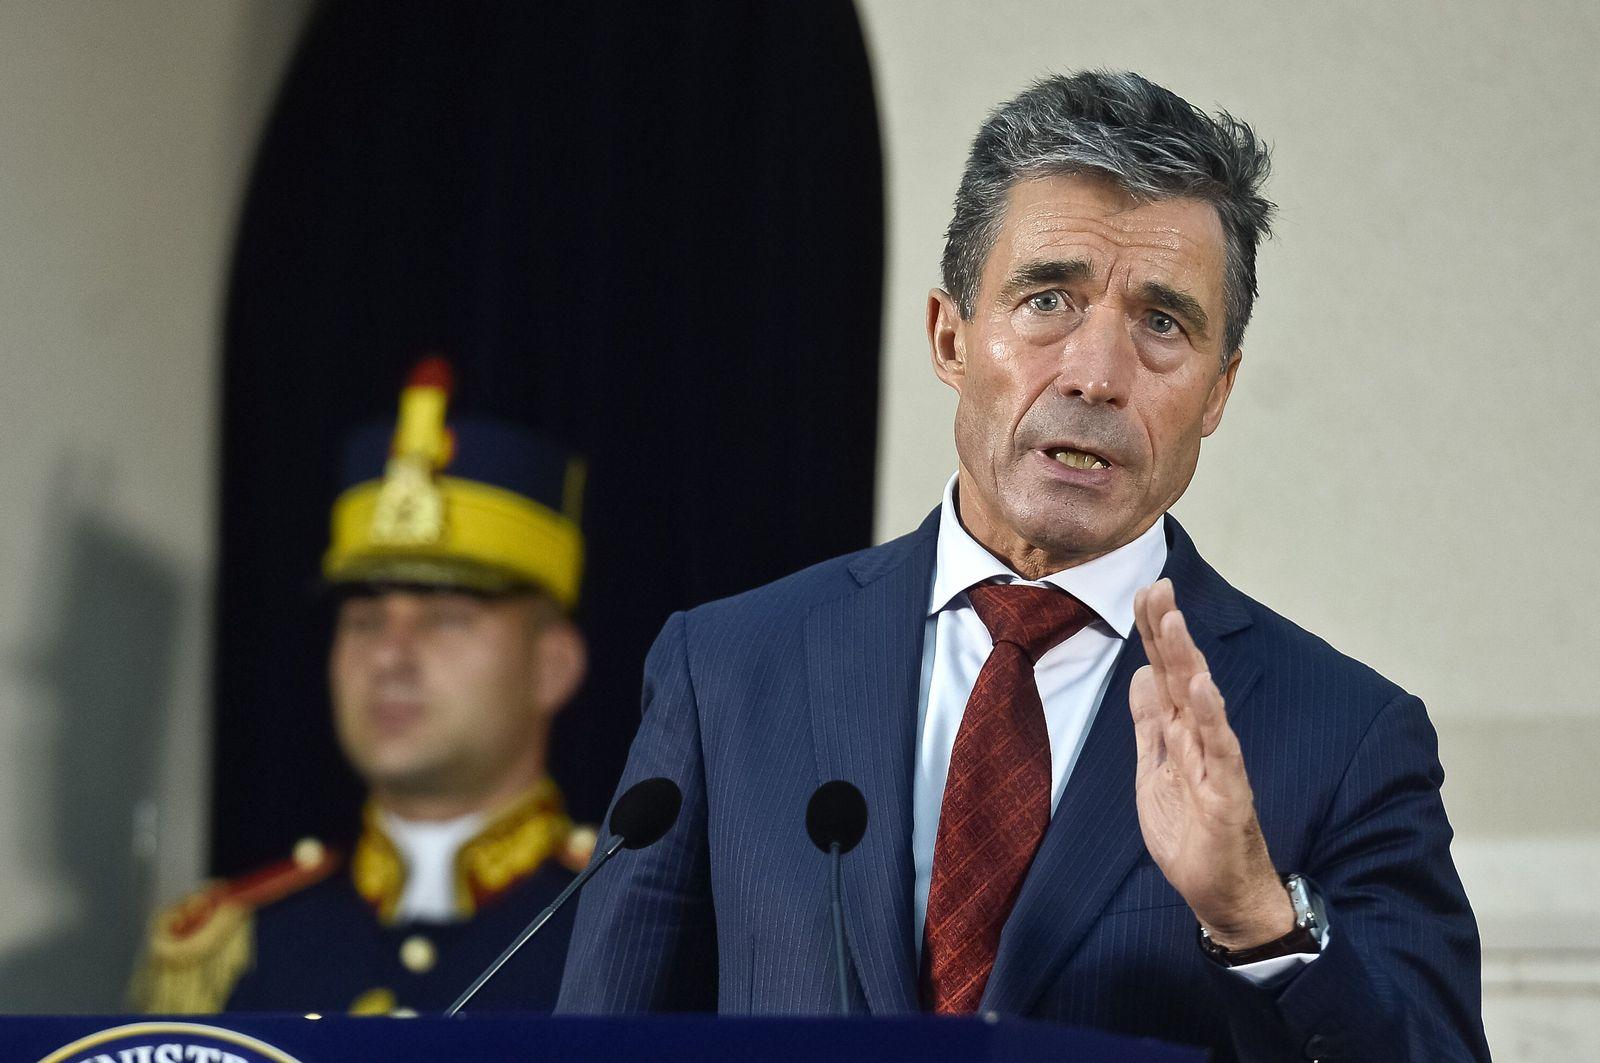 NATO / Anders Fogh Rasmussen